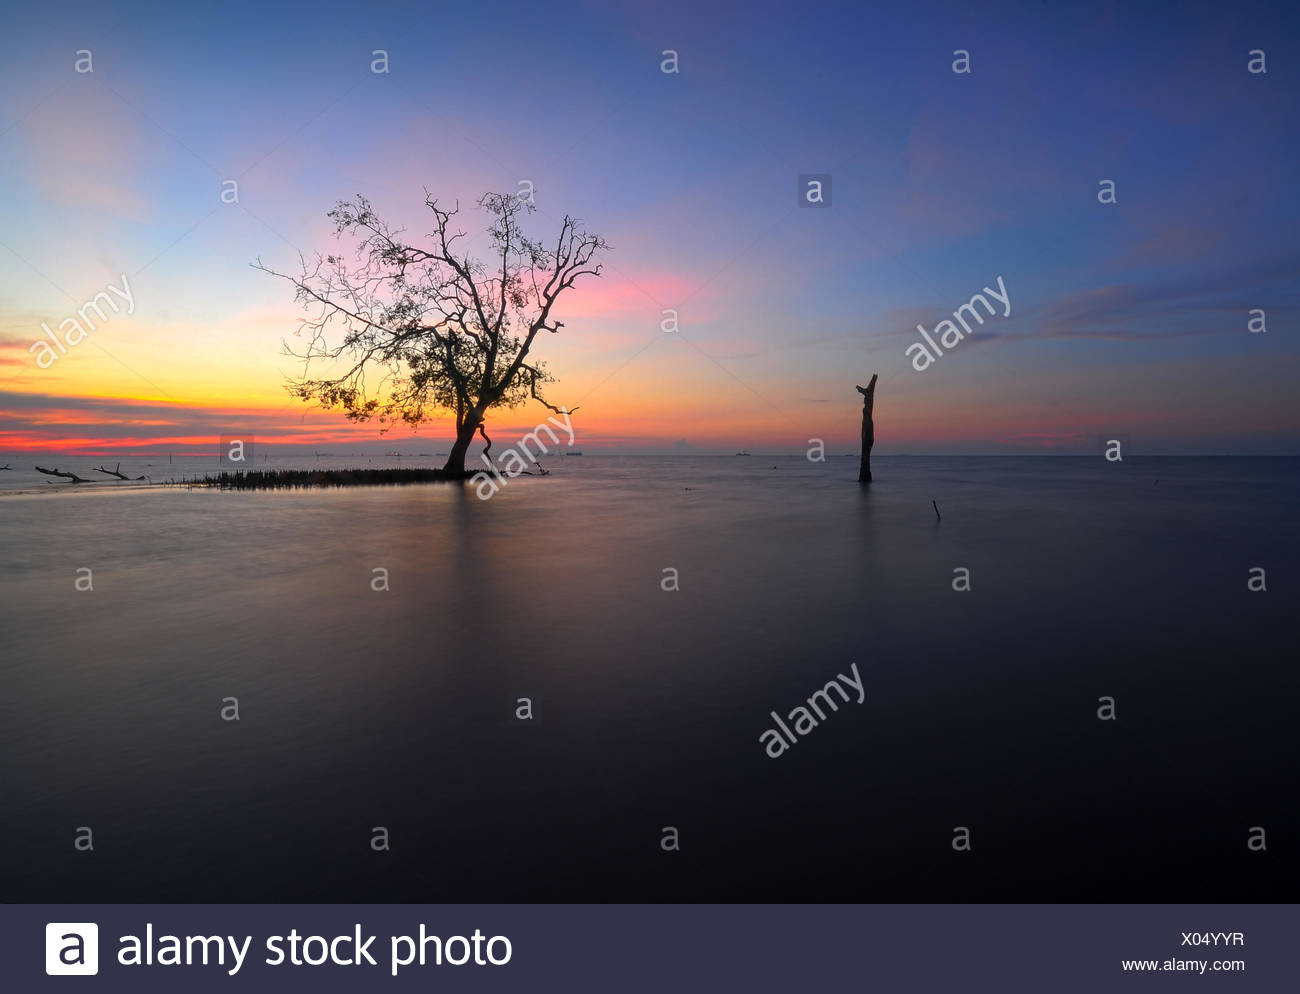 Malaysia, Selangor, Banting, Single tree on Kelanang Beach at sunset - Stock Image